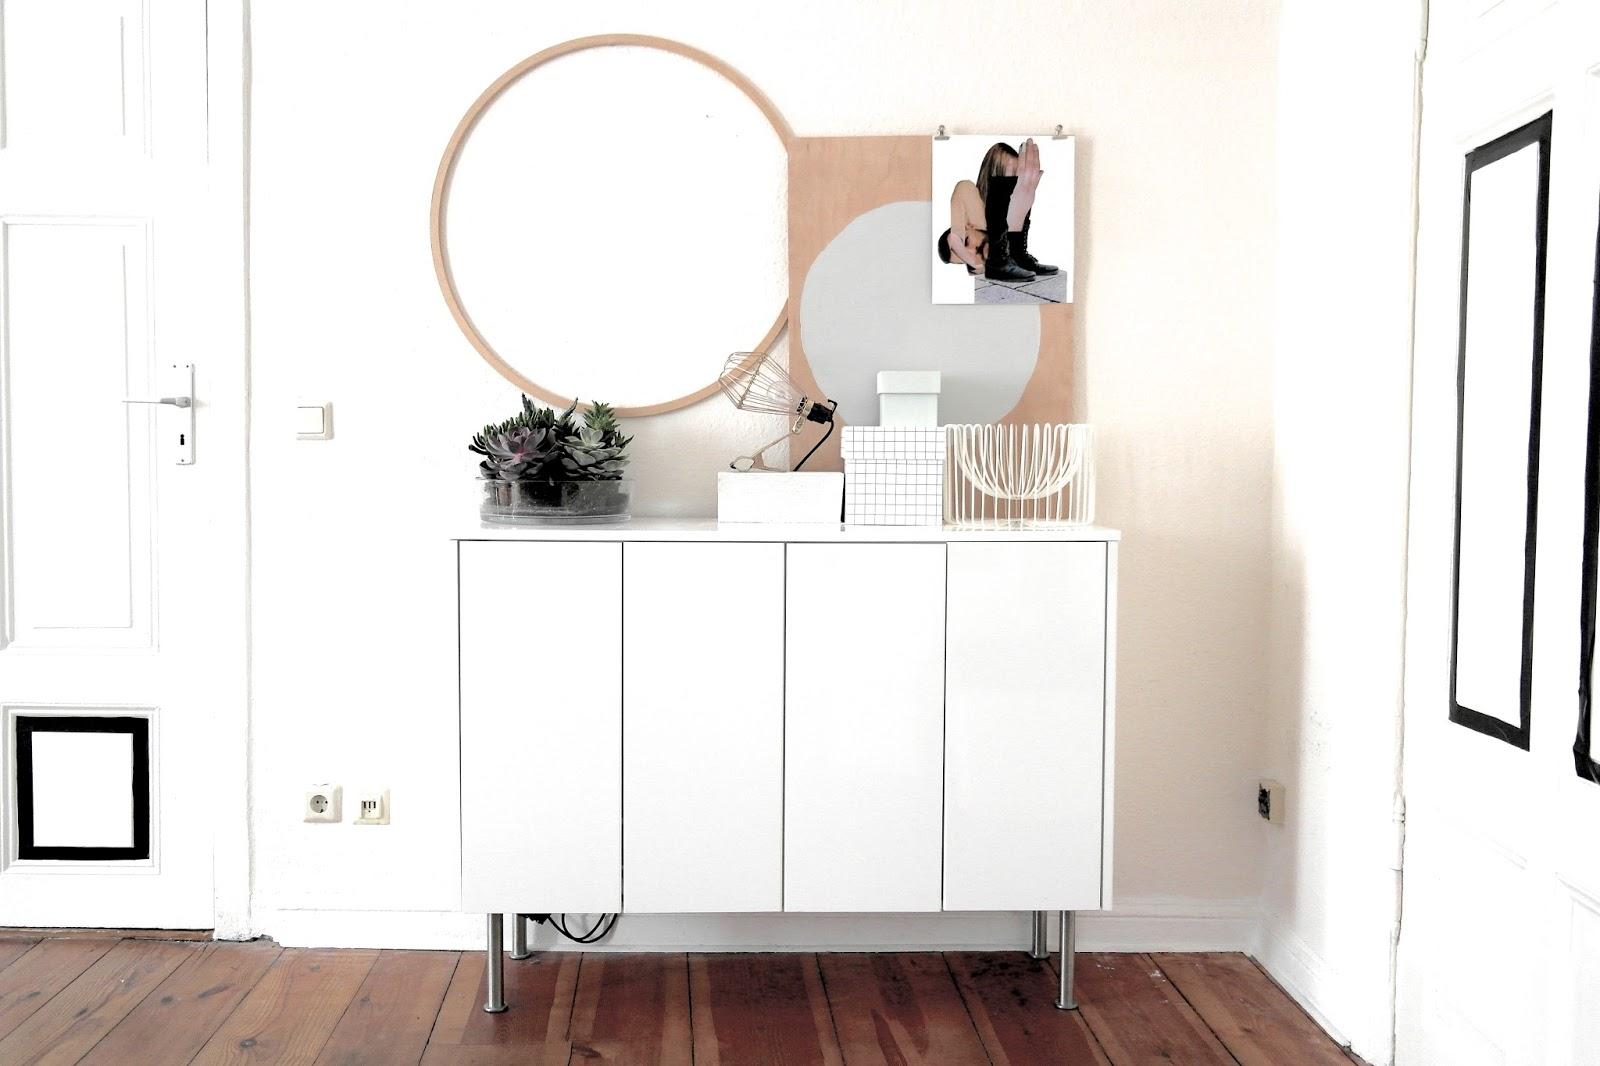 invitus diy 24 hochglanz sideboard. Black Bedroom Furniture Sets. Home Design Ideas